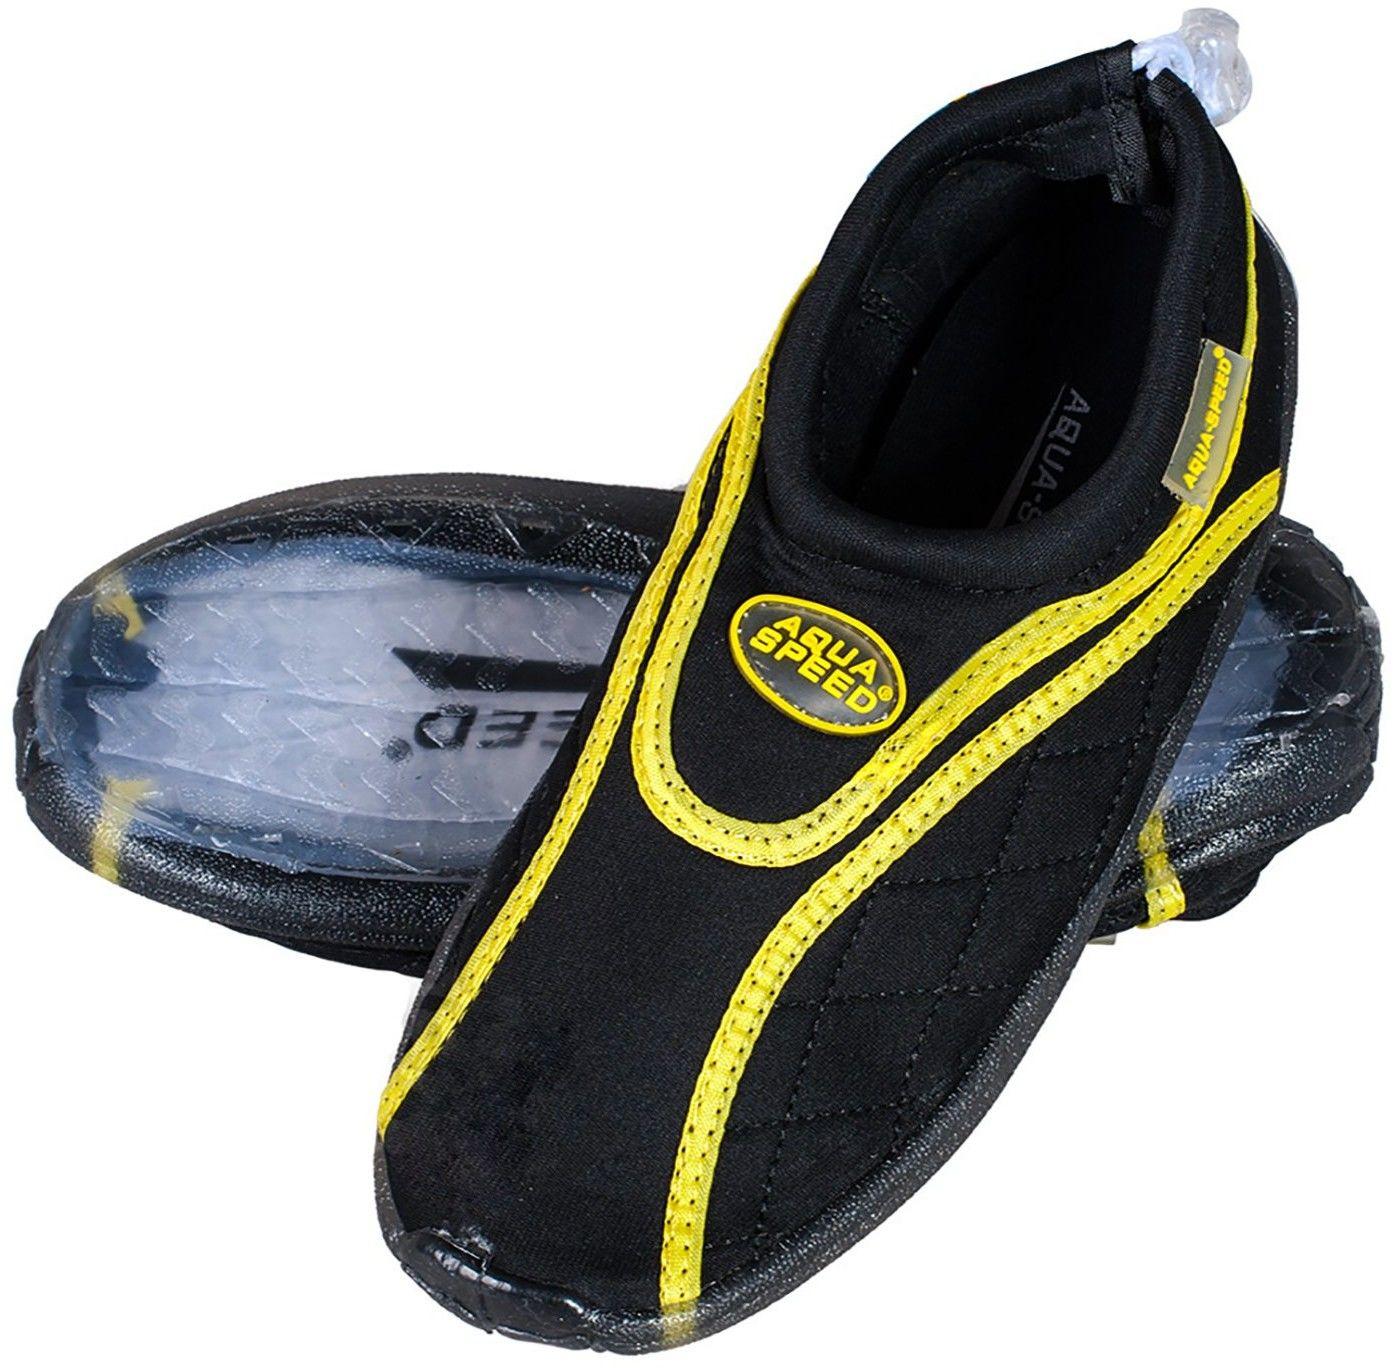 Buty do wody AQUA SHOE AquaSpeed 9 Rozmiar buta: 35